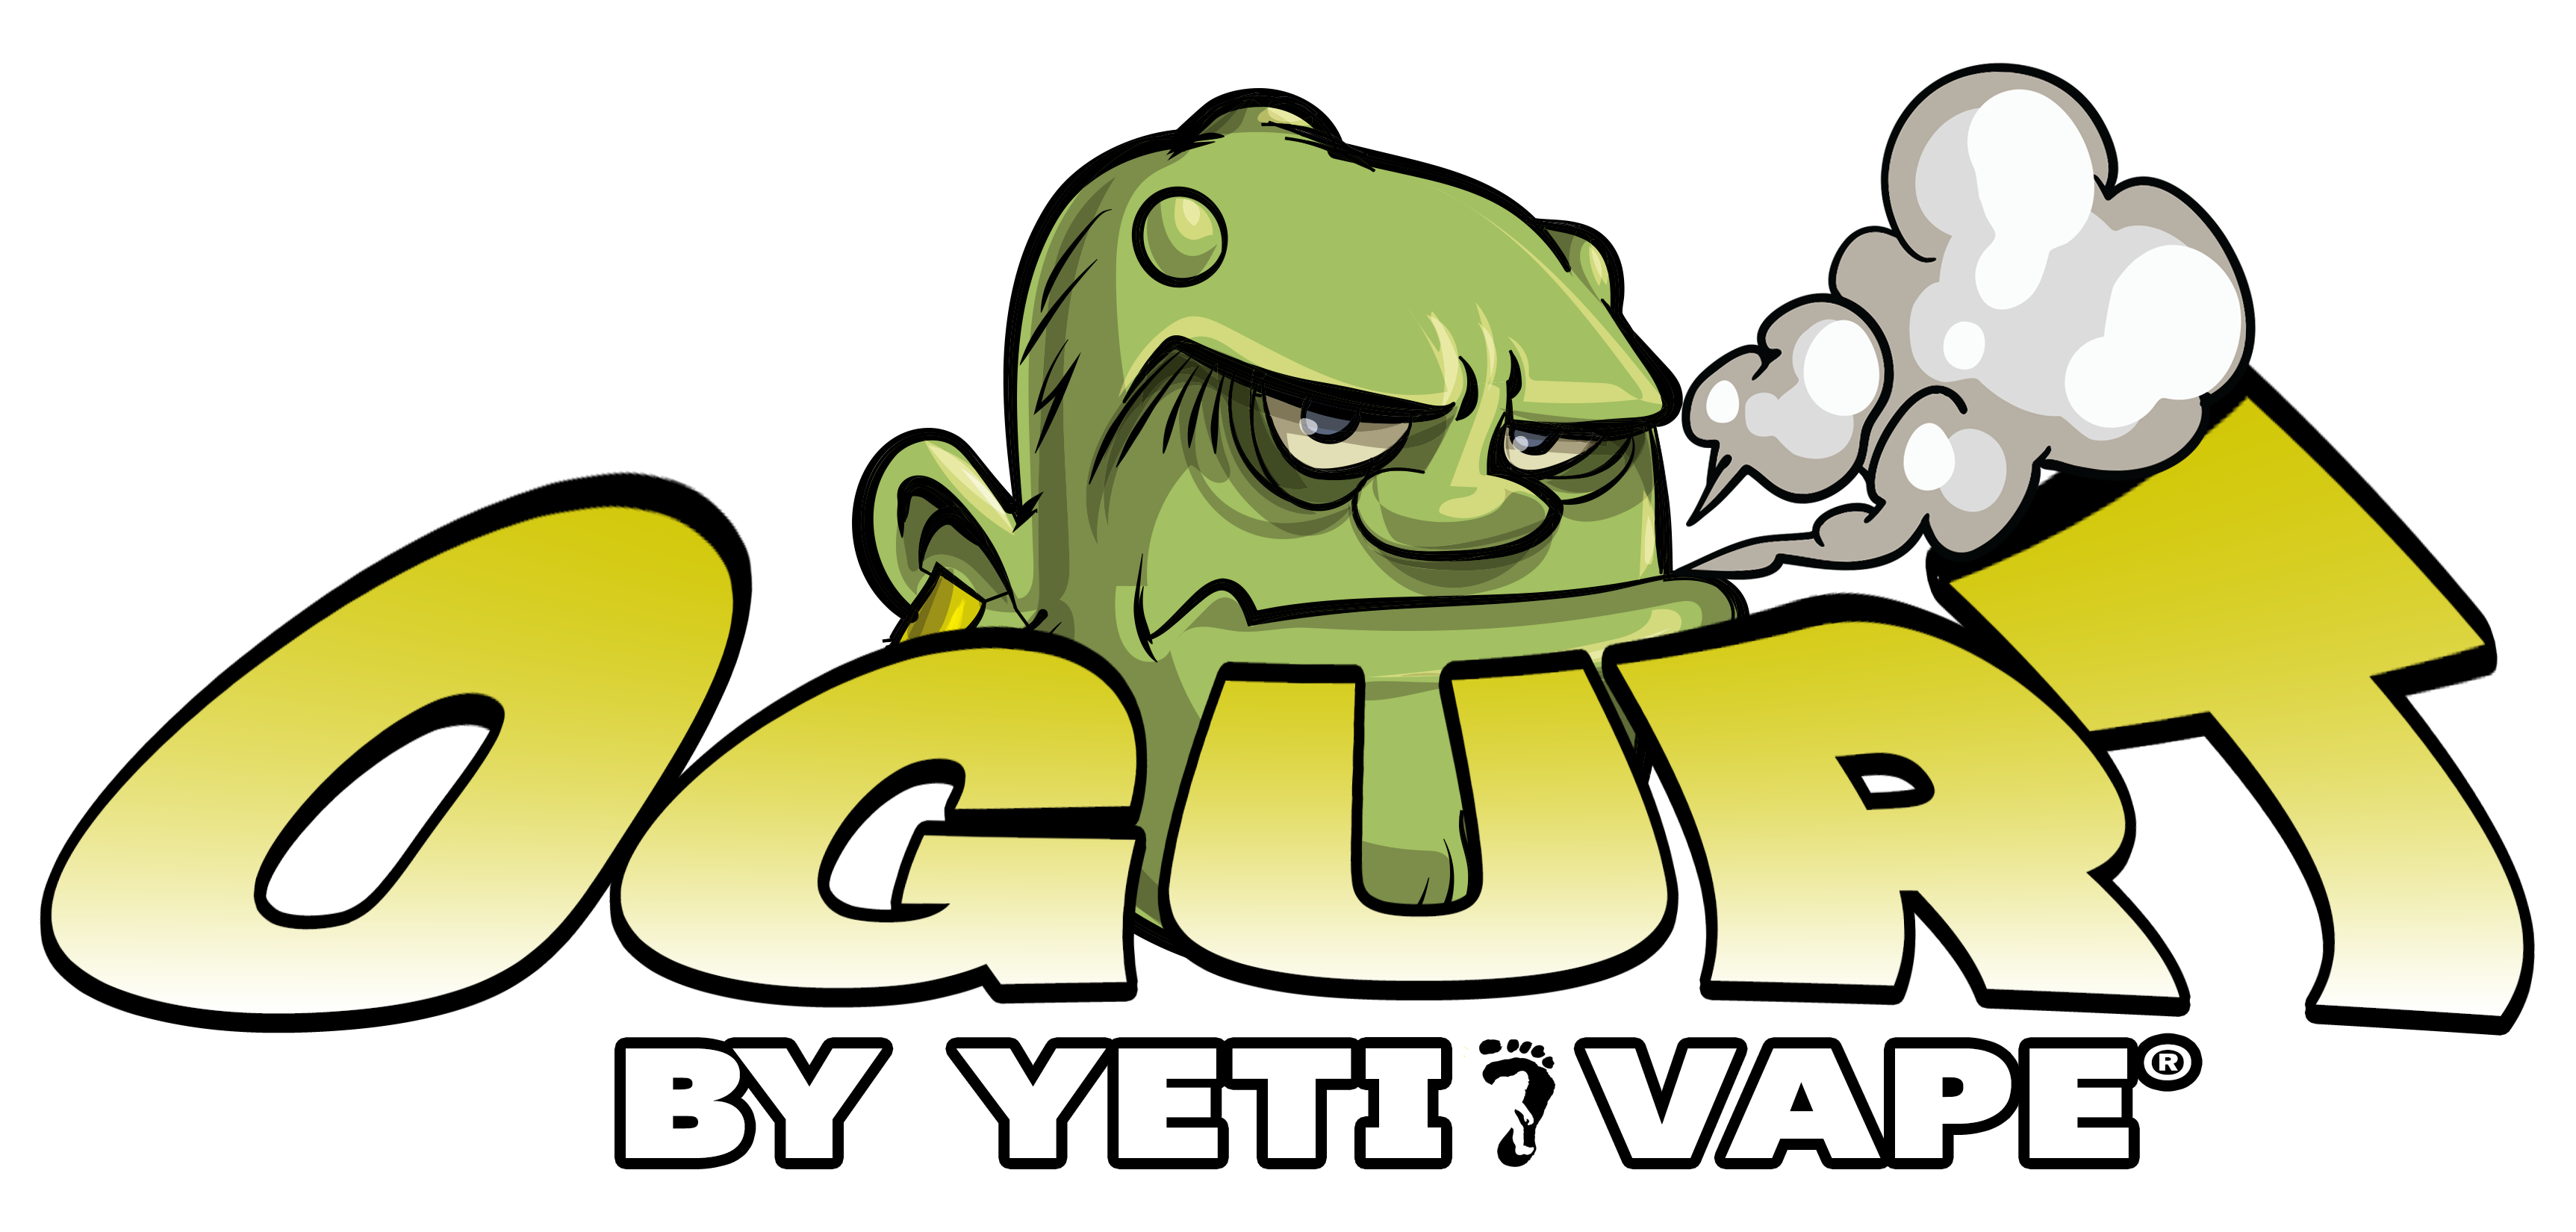 Yeti Vape - What is vehicle invoice price best online vape store